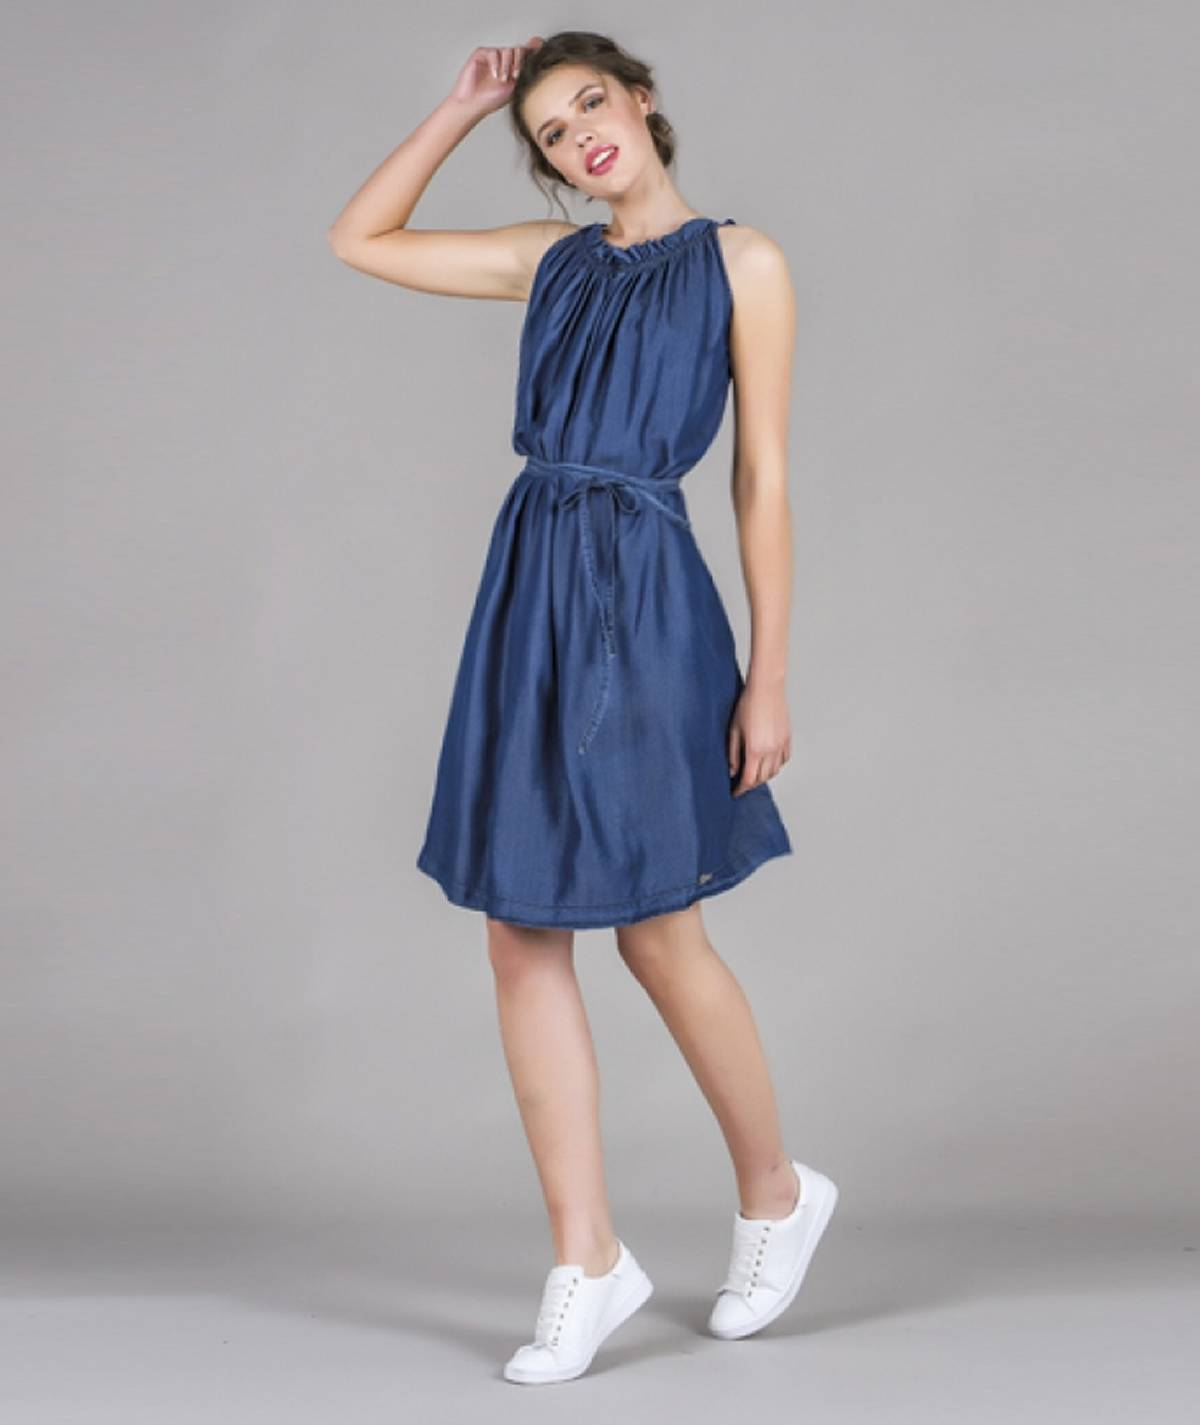 [CHIESSY] Vestido tencel